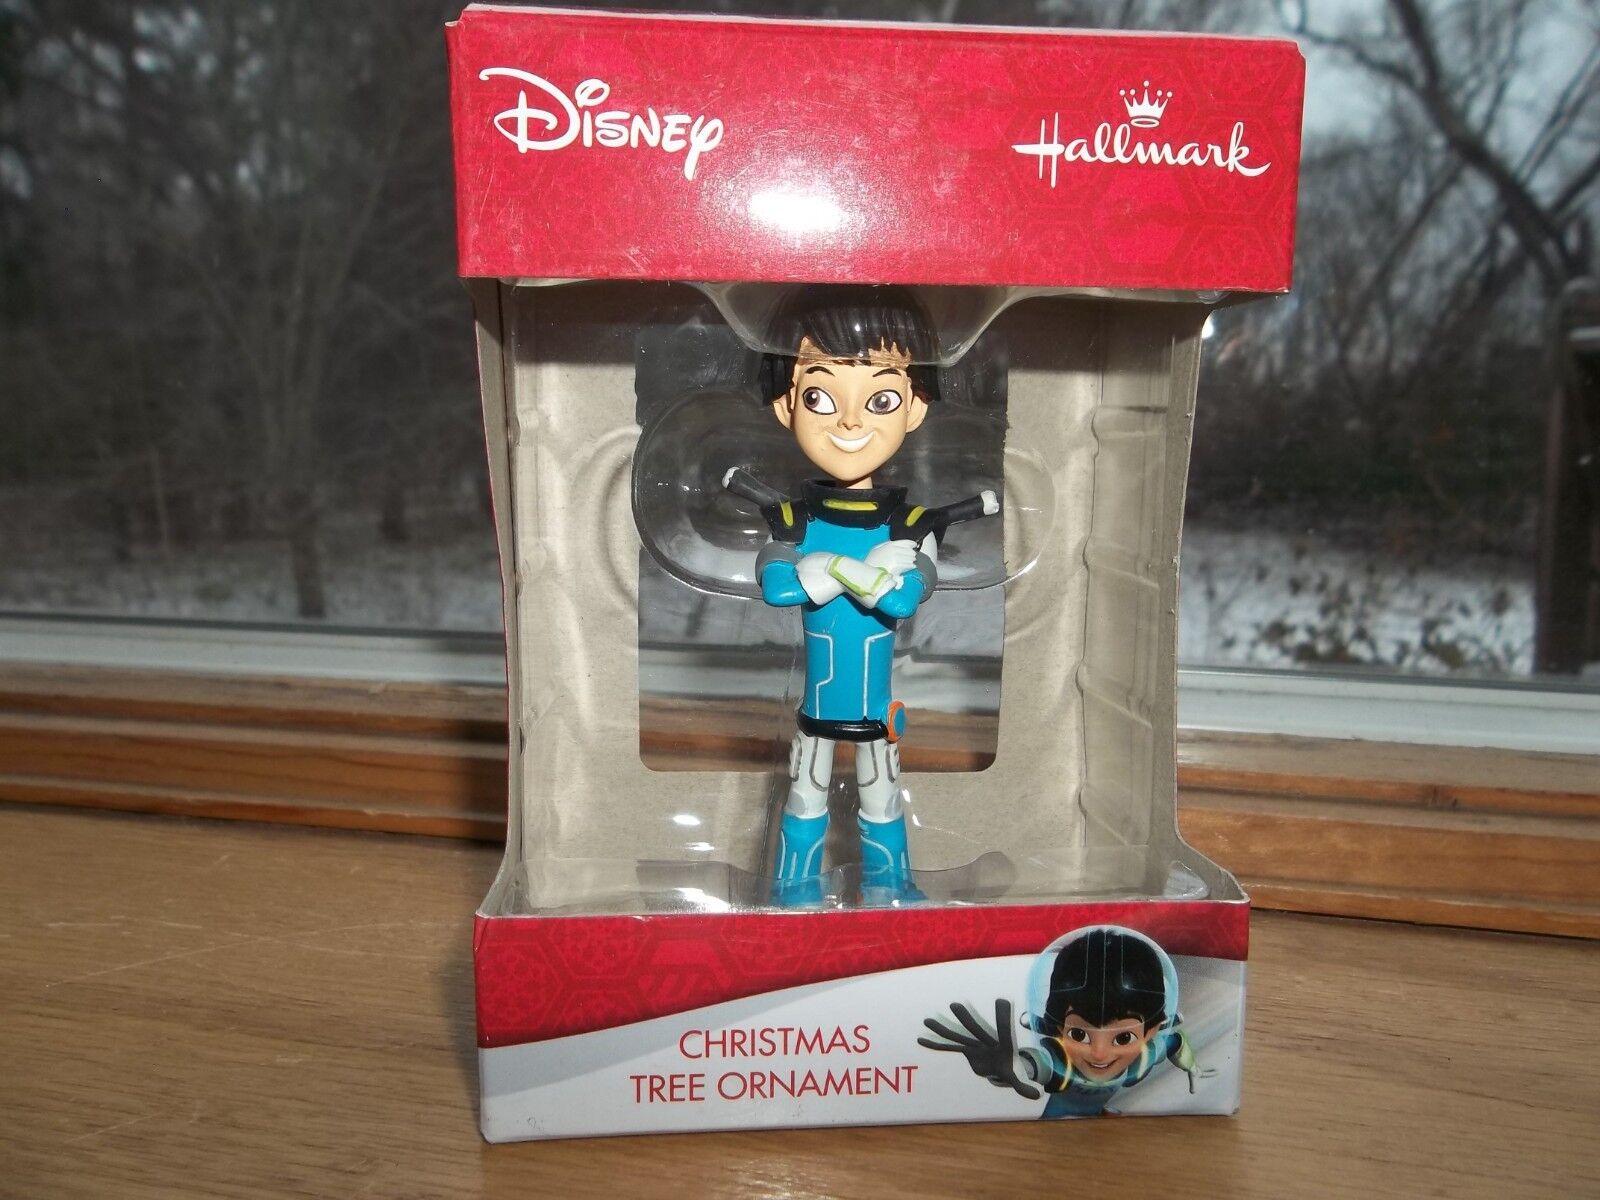 Disney Junior Hallmark Miles from Tomorrowland Christmas Tree Ornament NIB